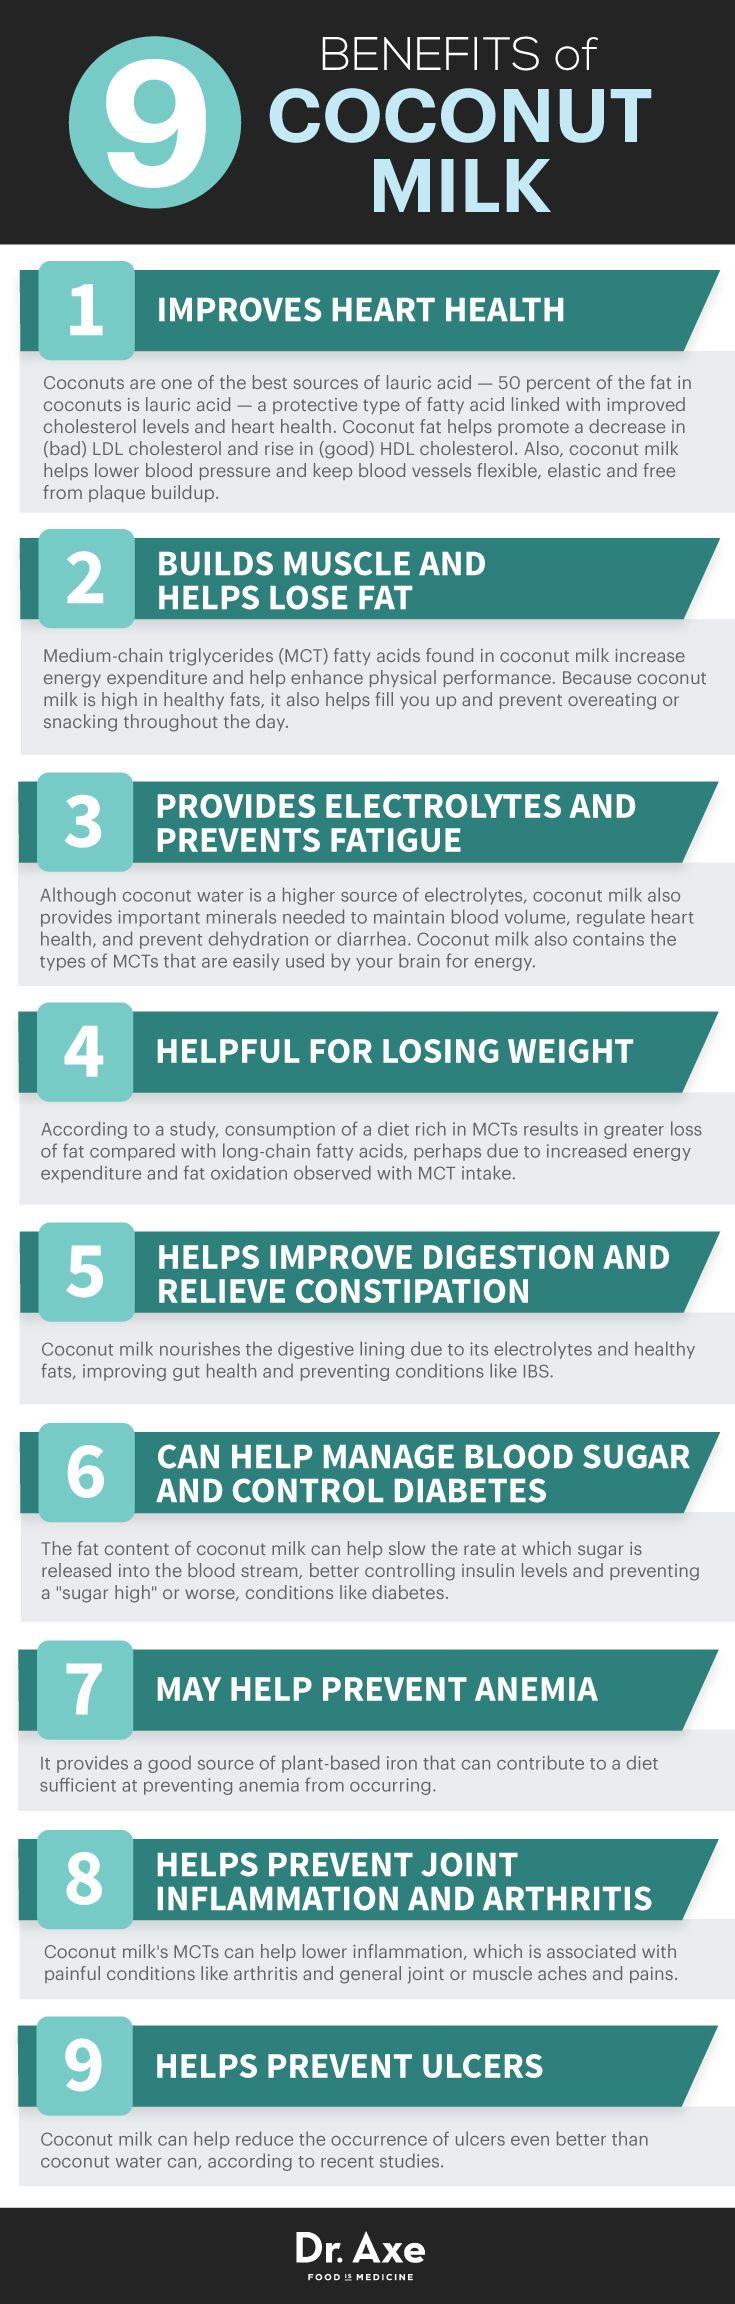 Coconut milk benefits http://www.draxe.com #health #holistic #natural